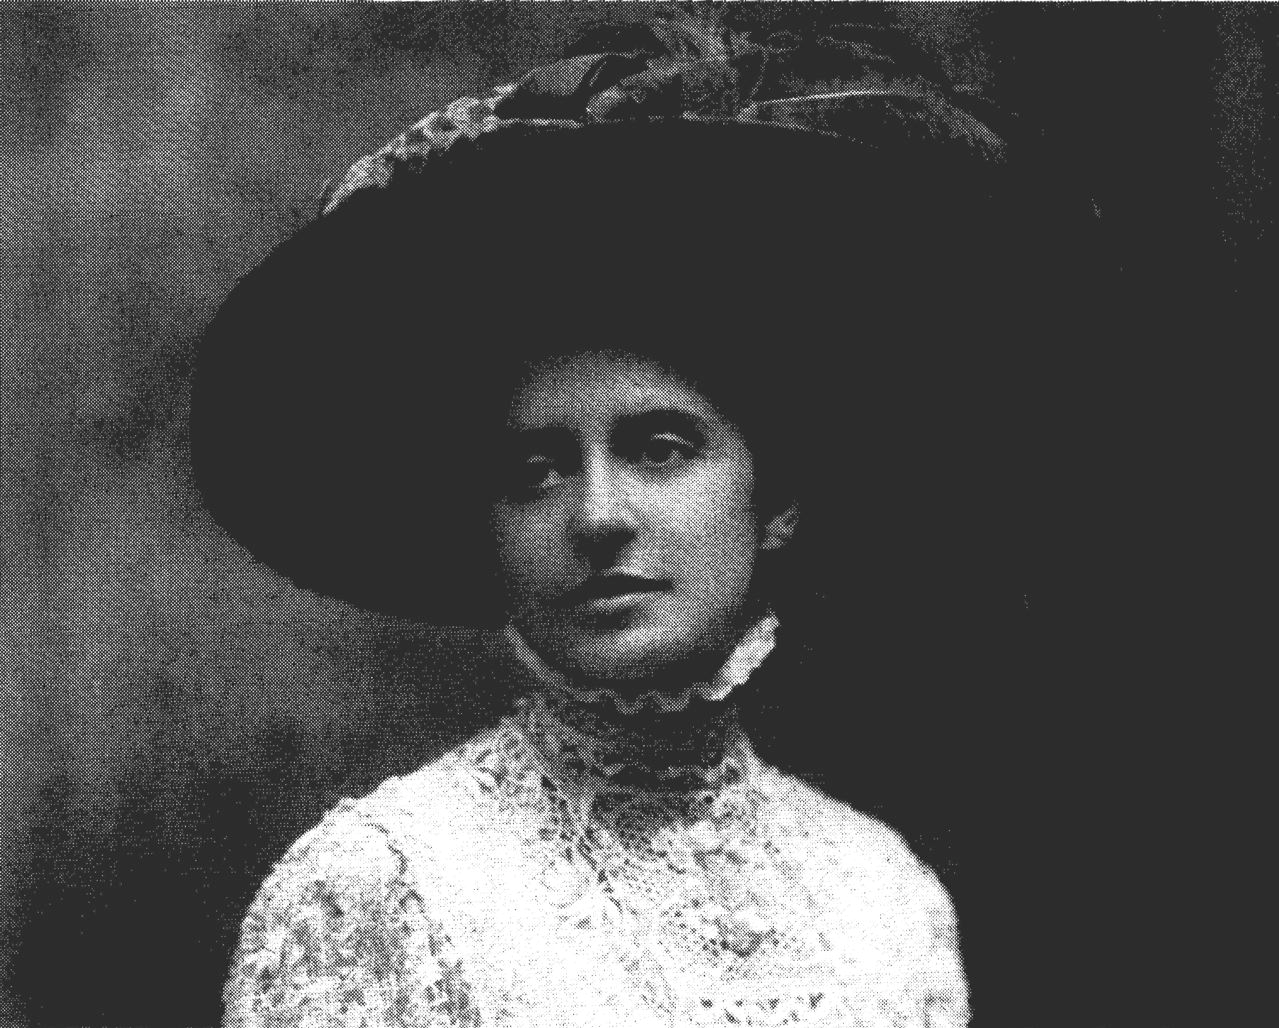 Tatyana Schloezer